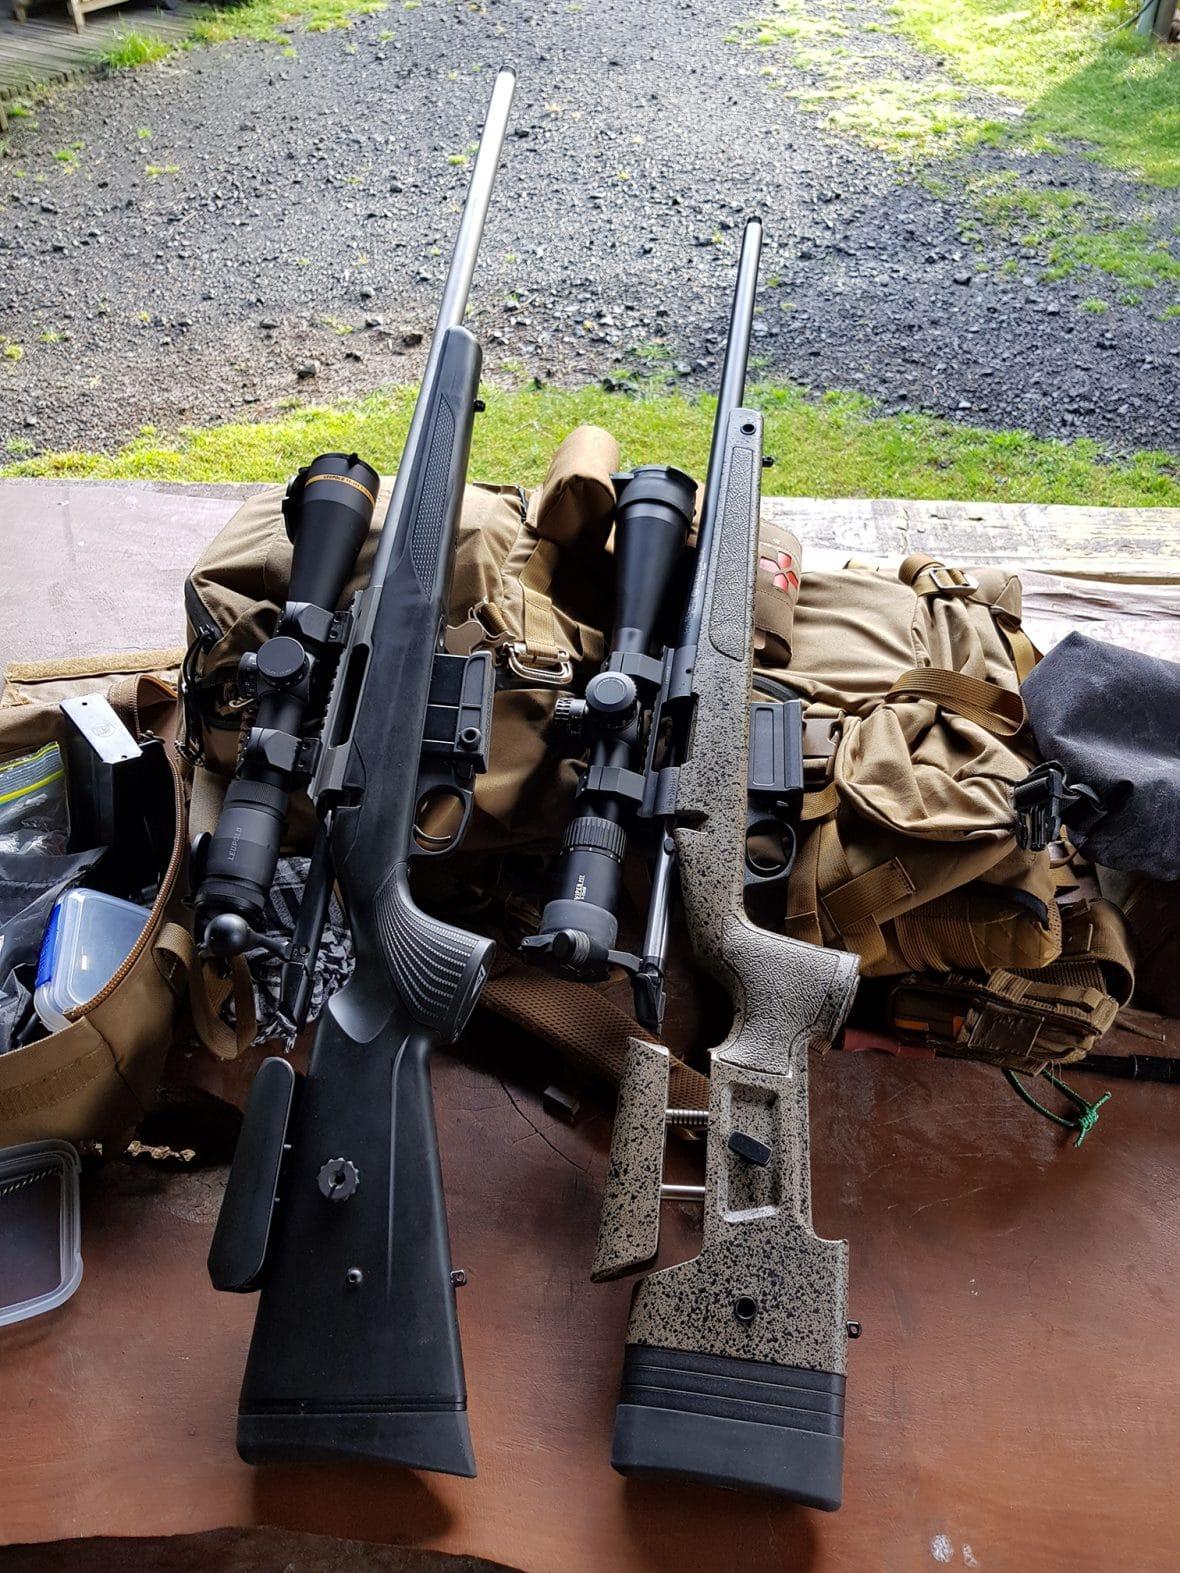 The Crossover Rifles – a Tikka CTR and Bergara HMR